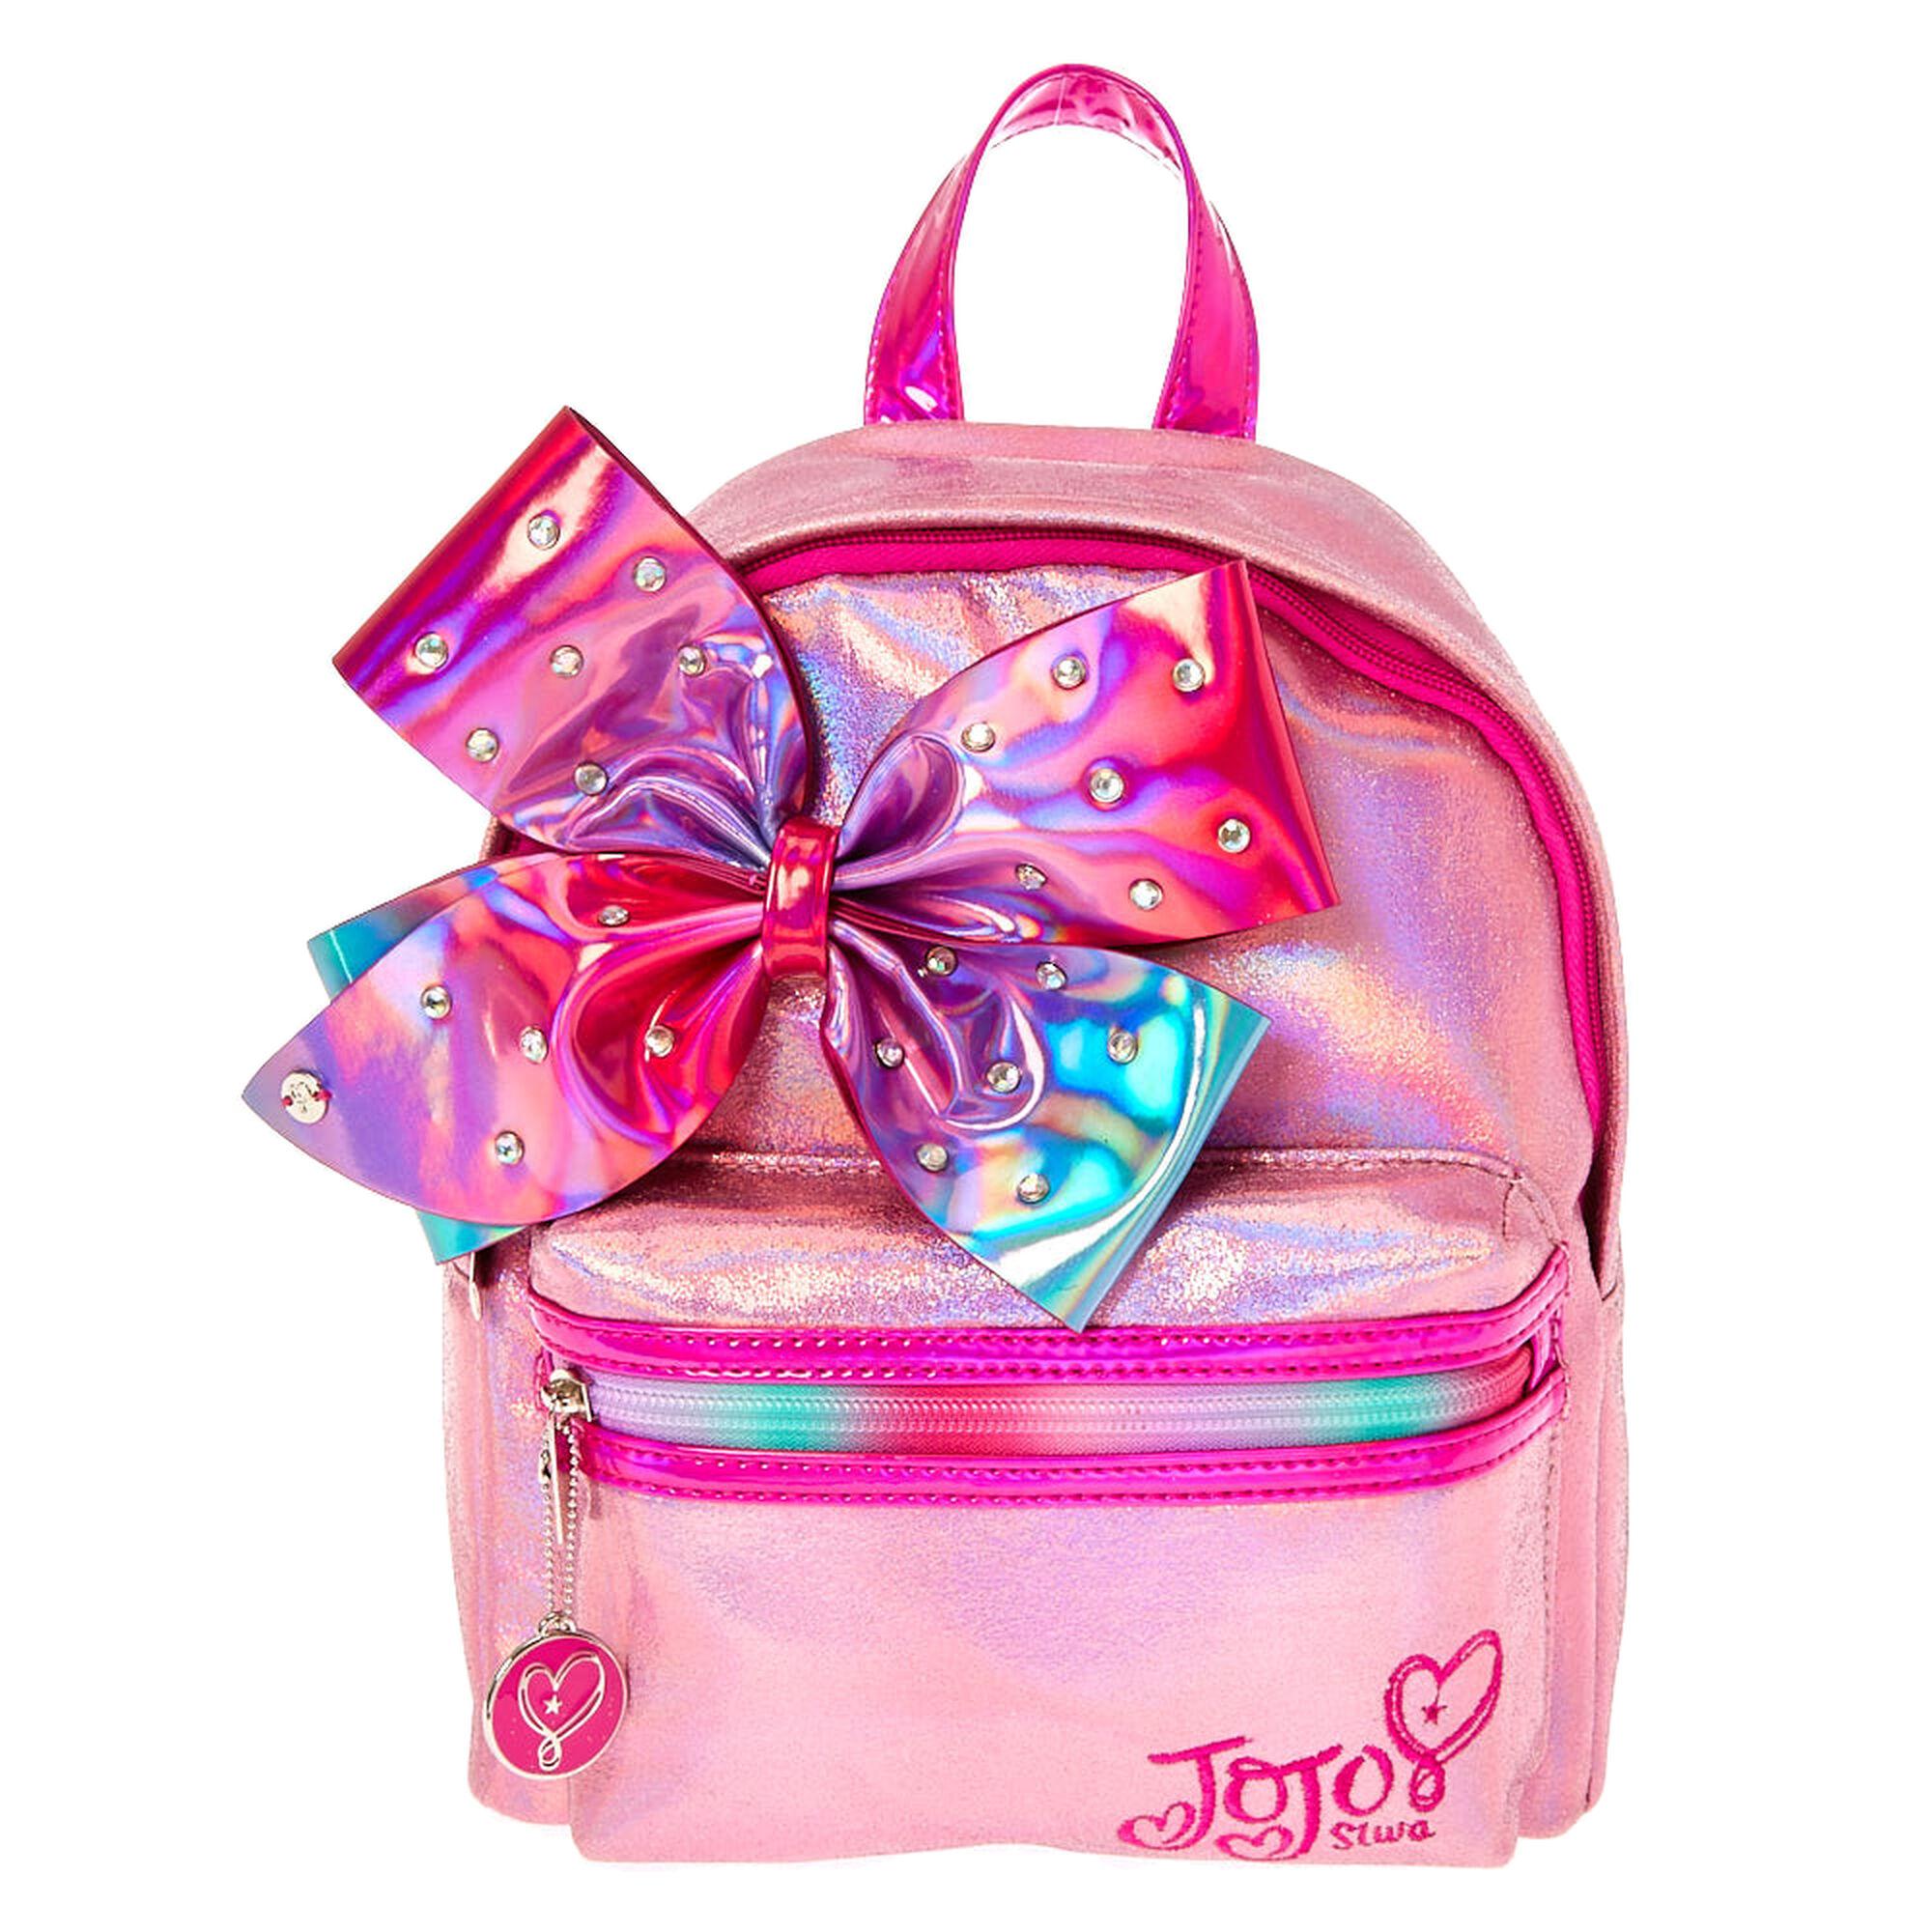 Jojo Siwa Pink Shimmer Bedazzled Bow Mini Backpack